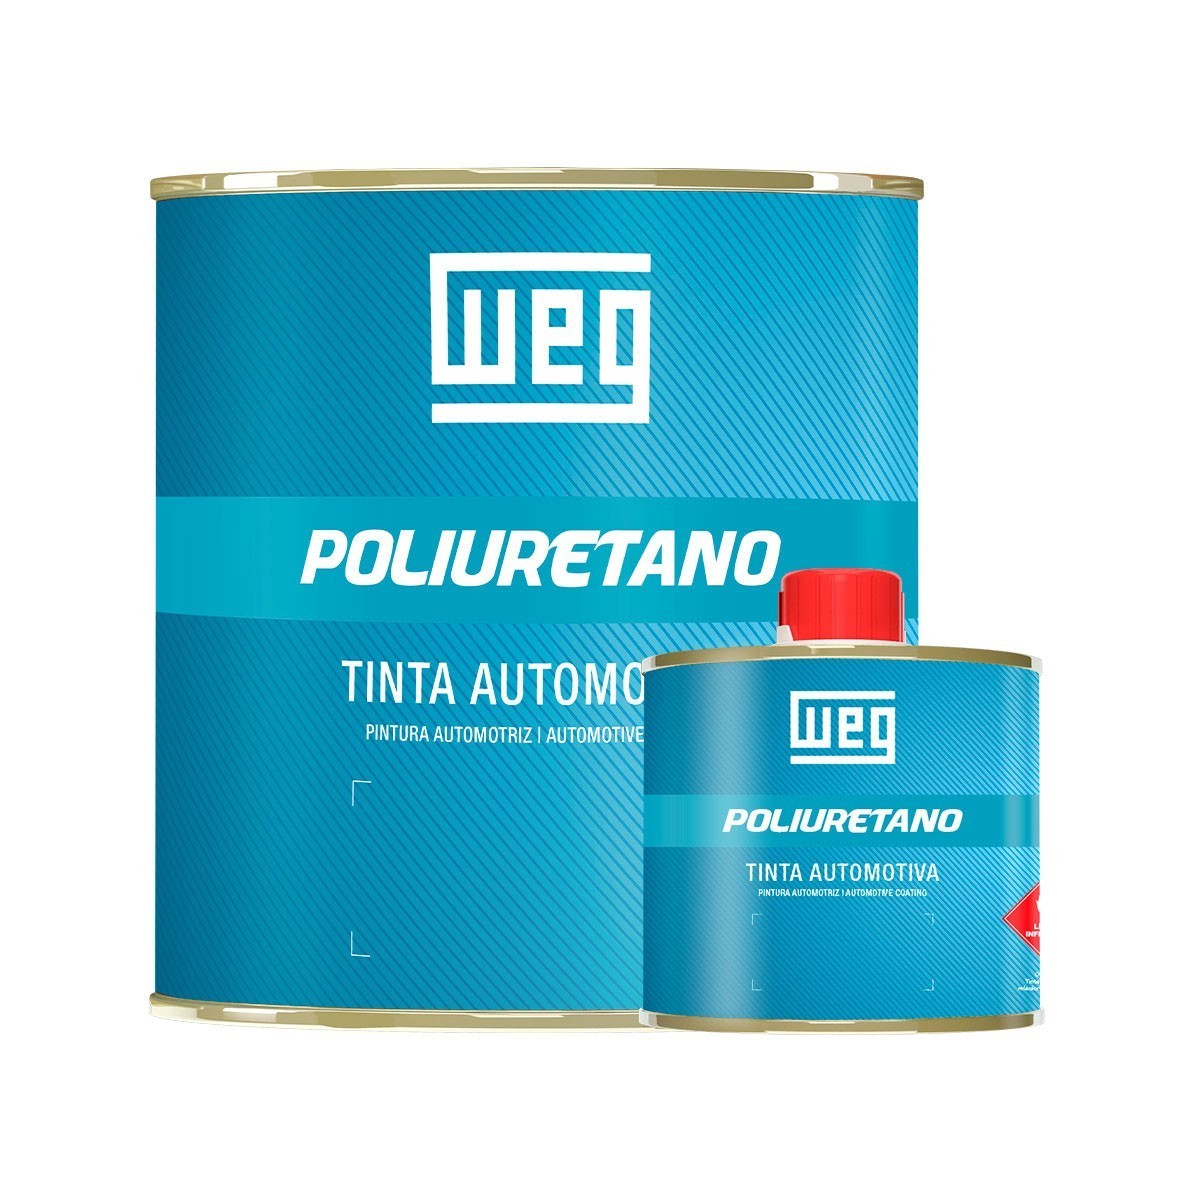 TINTA POLIURETANO VERMELHO FLASH 2   VOLKSWAGEN 2000   675 ml